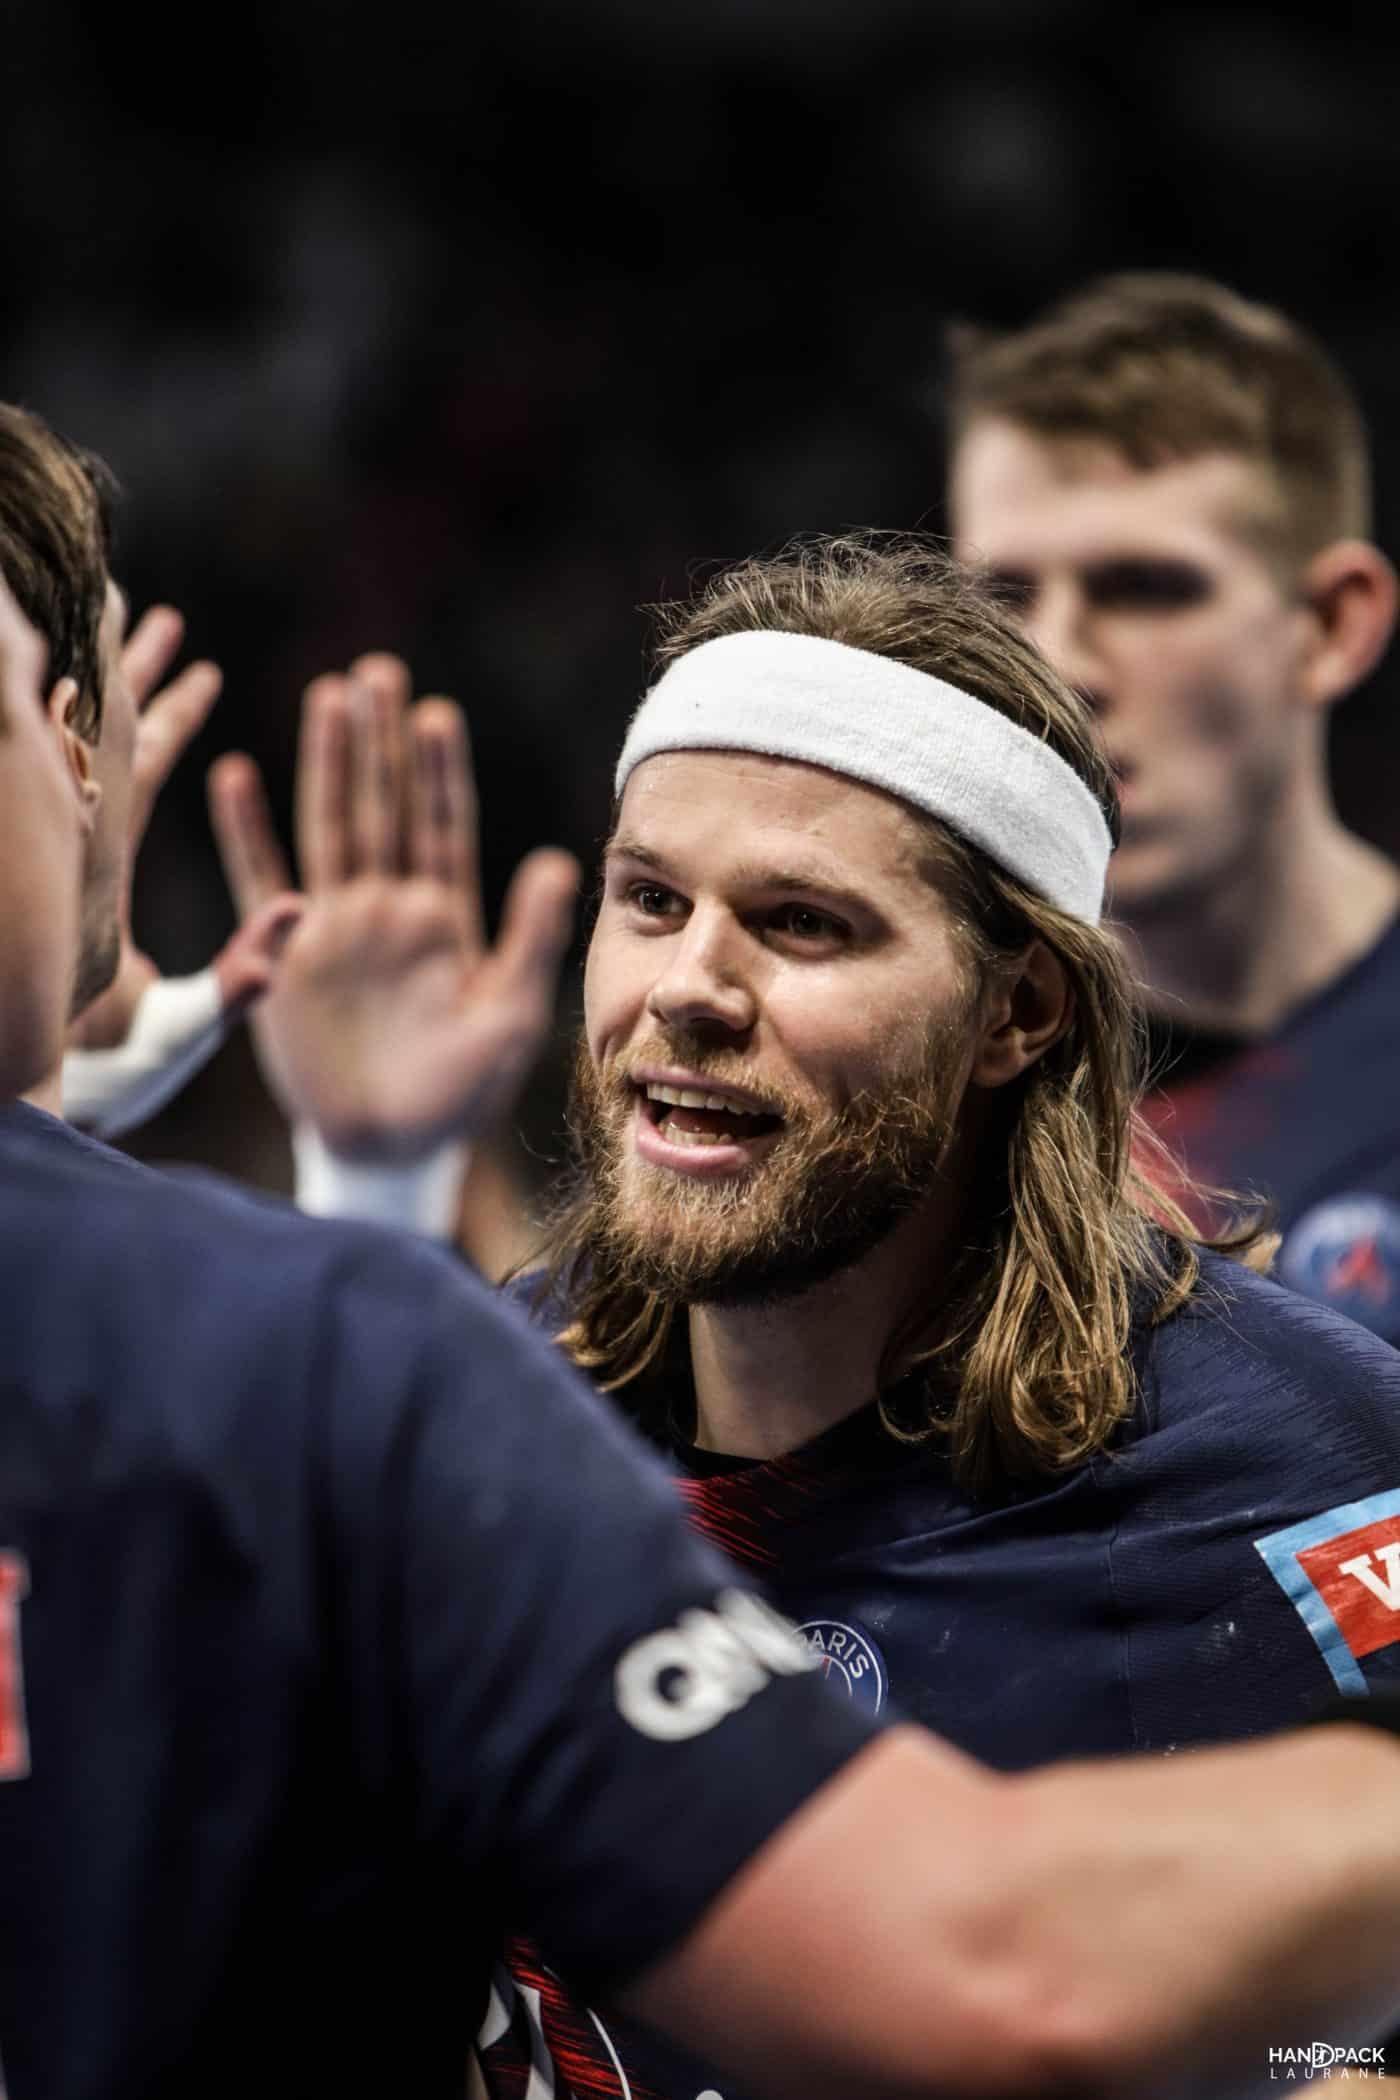 hbc-nantes-paris-saint-germain-handball-ligue-des-champions-2019-handpack-32